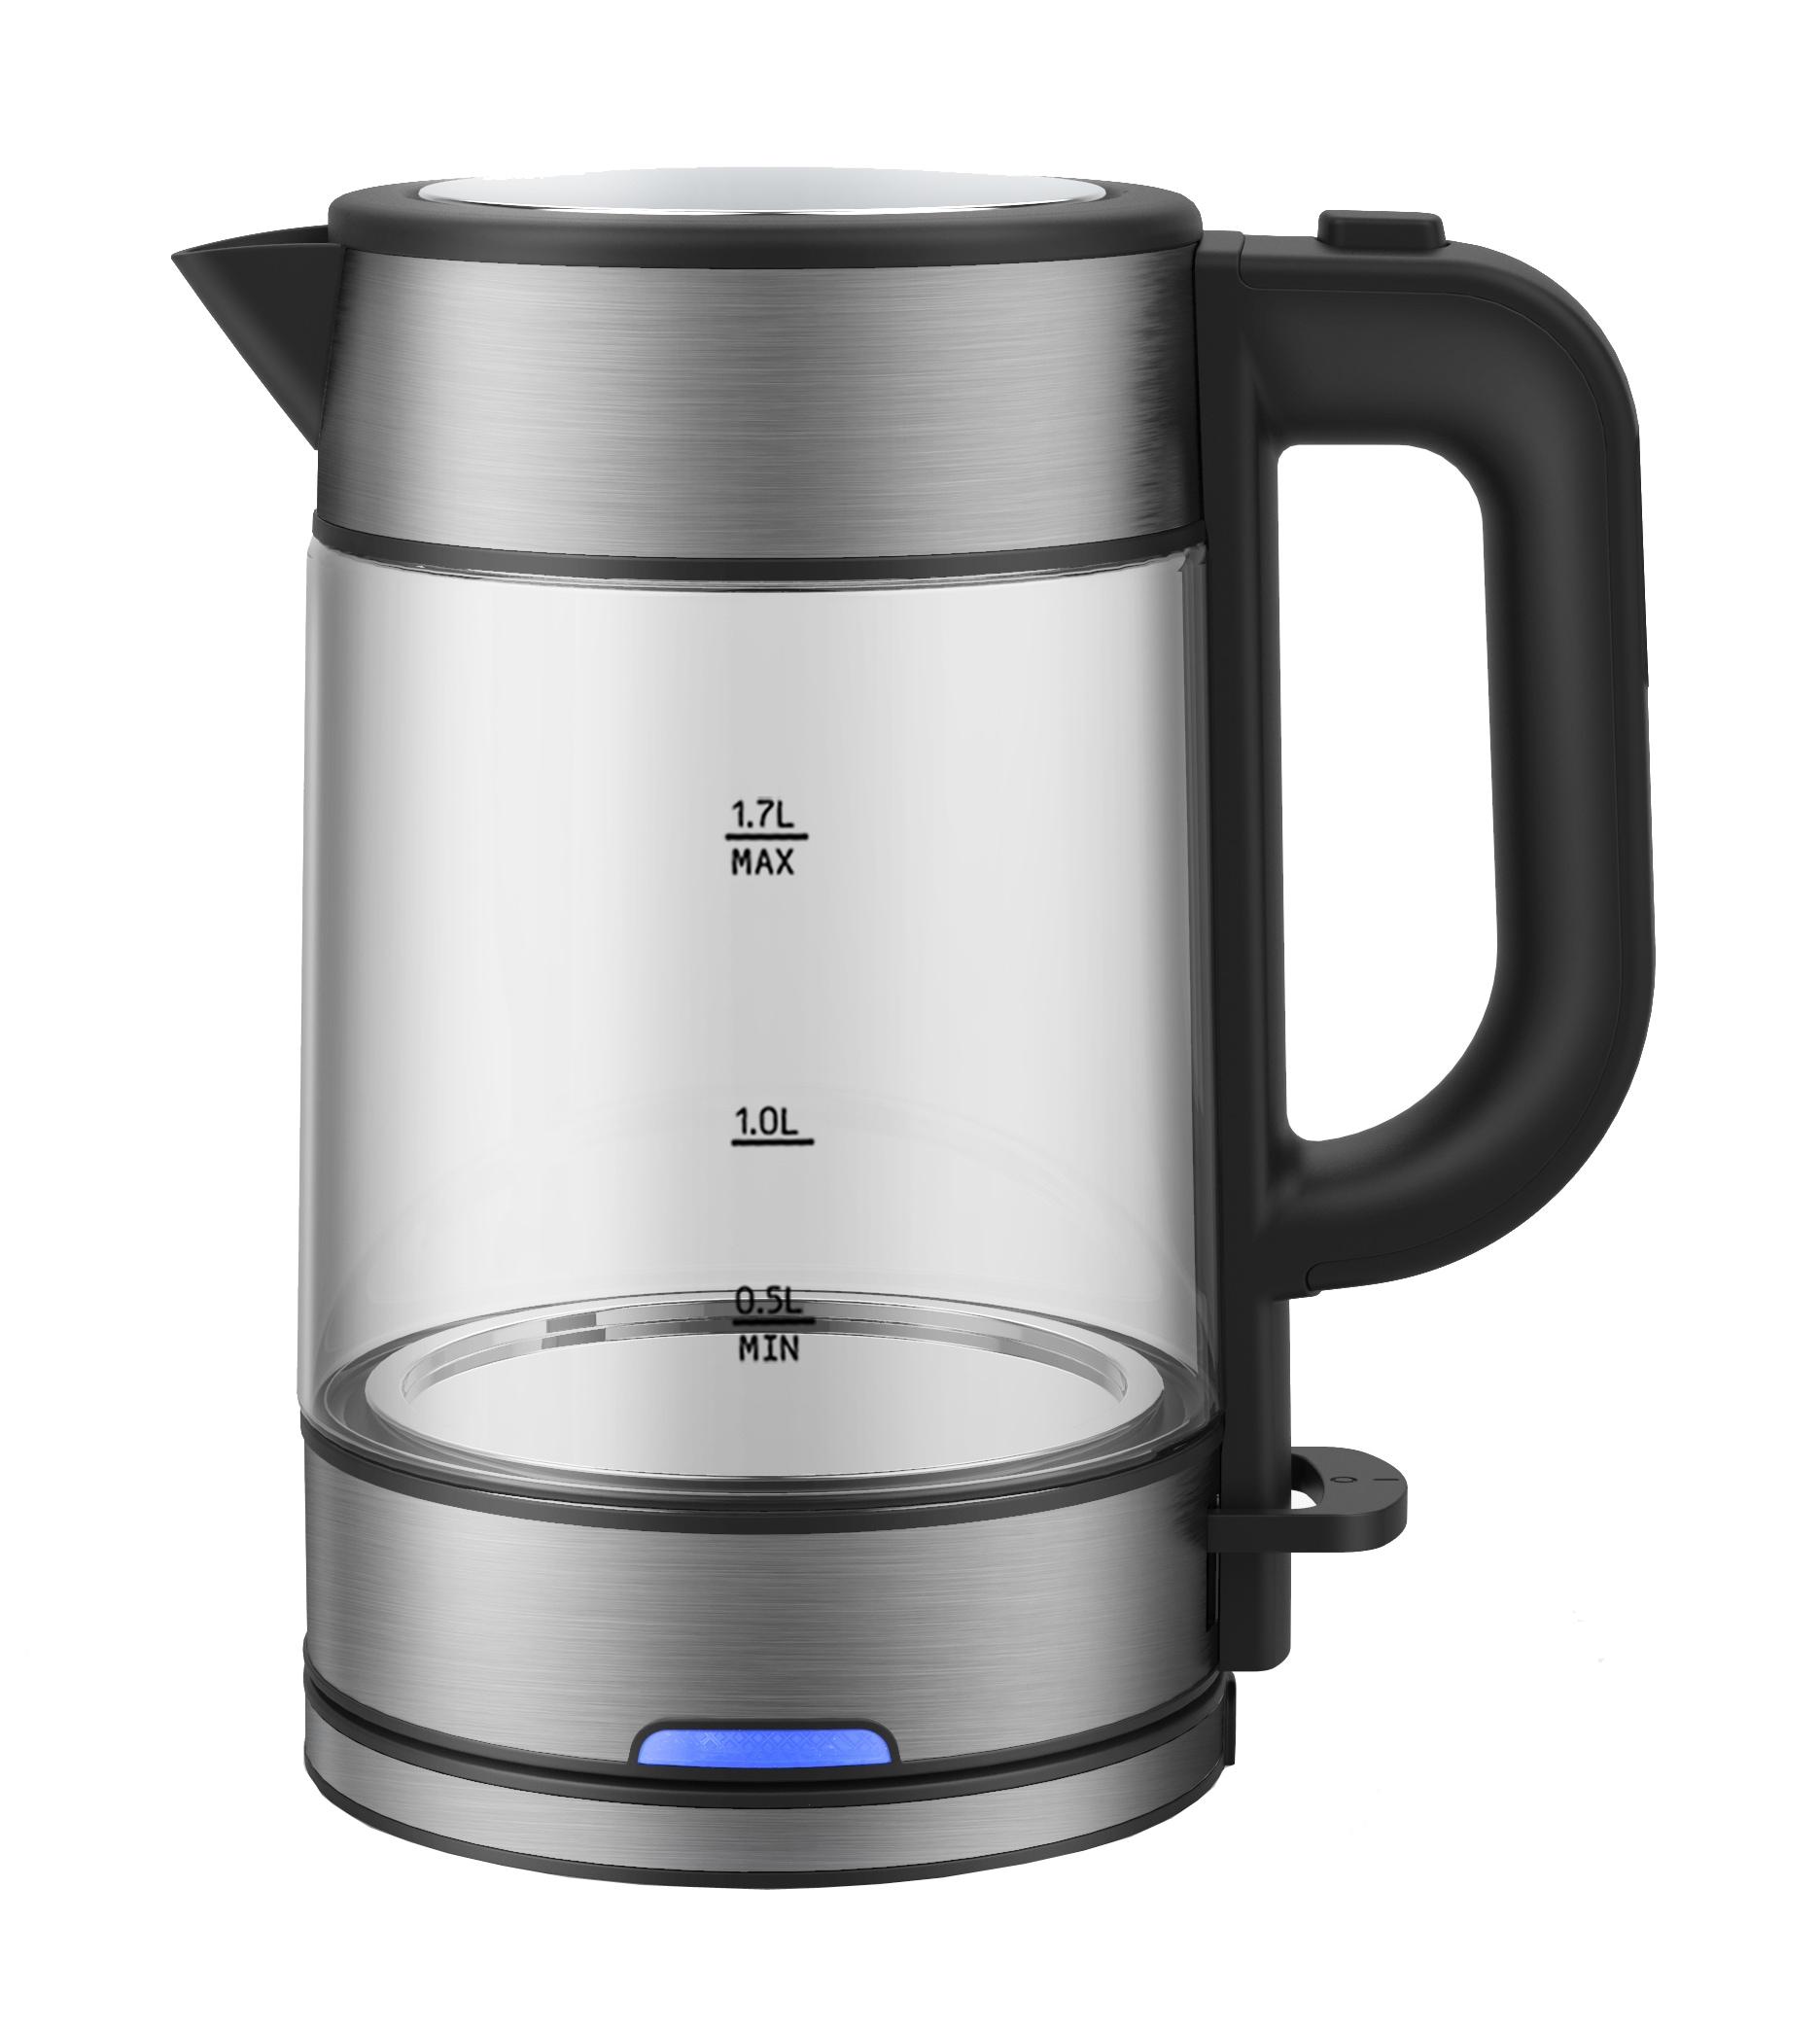 Trisa Wasserkocher Glass Boil ab 31,99 €   Preisvergleich